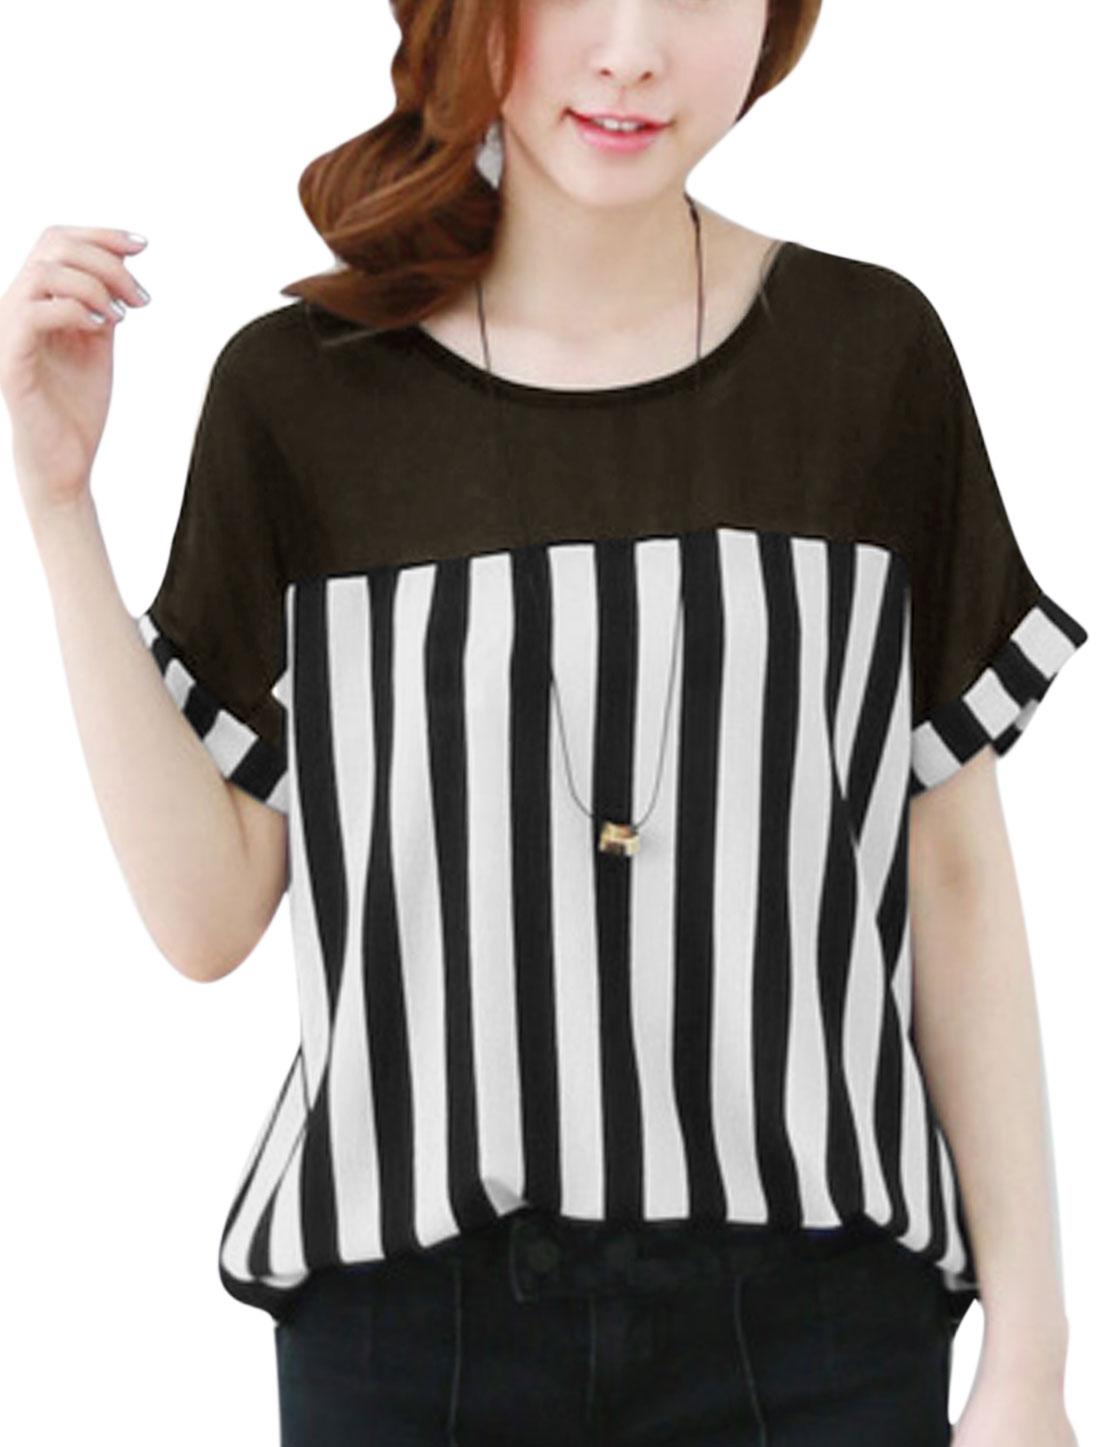 Lady Stripes Panel Design High Low Hem Chiffon Blouse Black White S